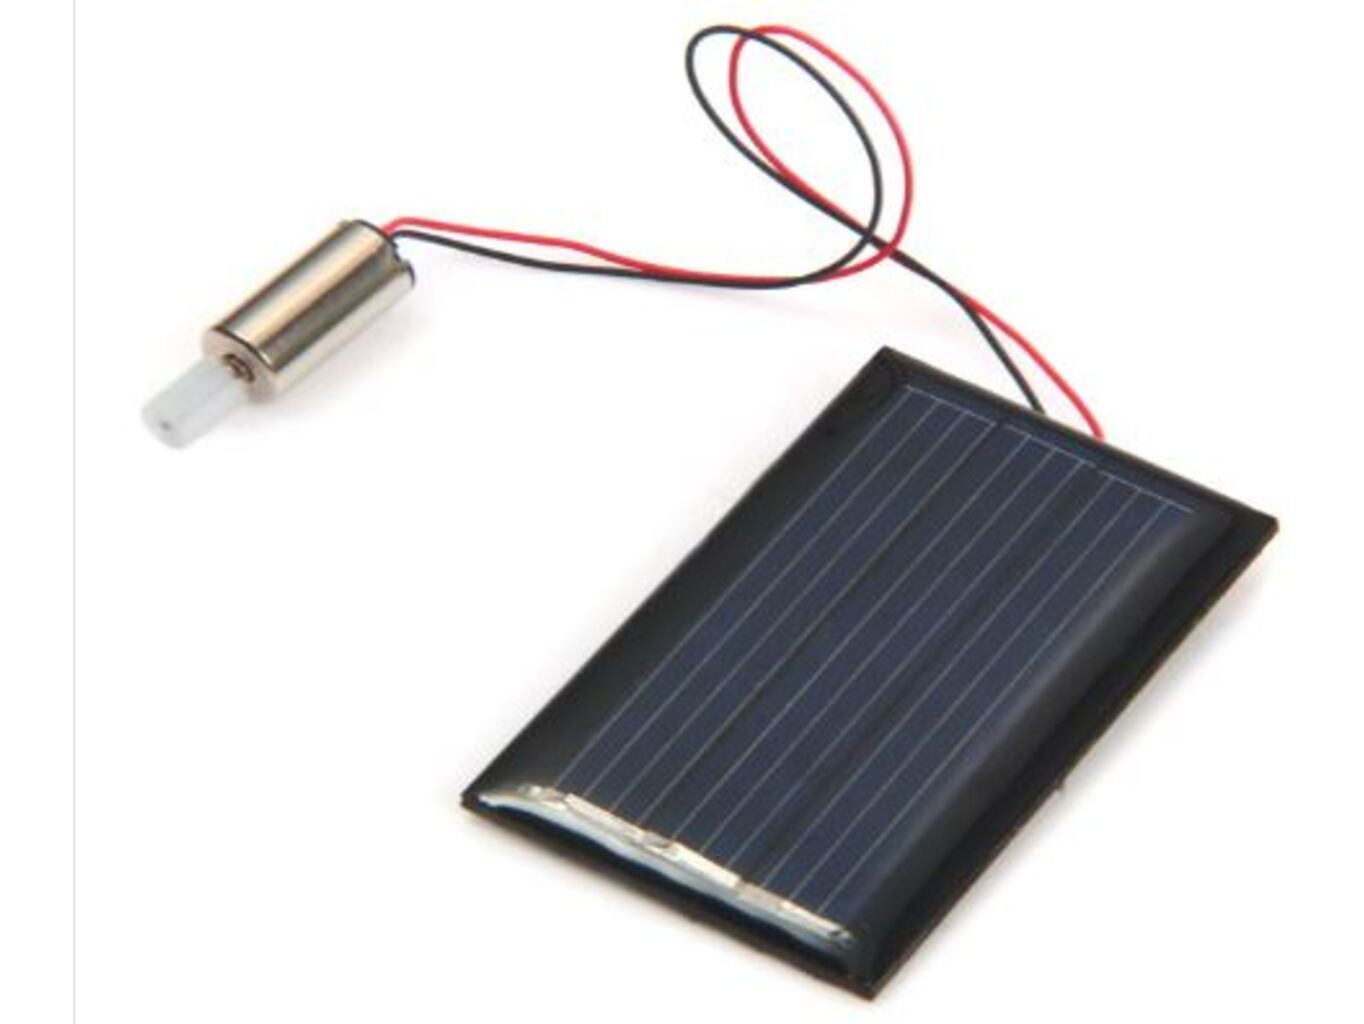 Solární stavebnice 4v1 robot dinosaurus